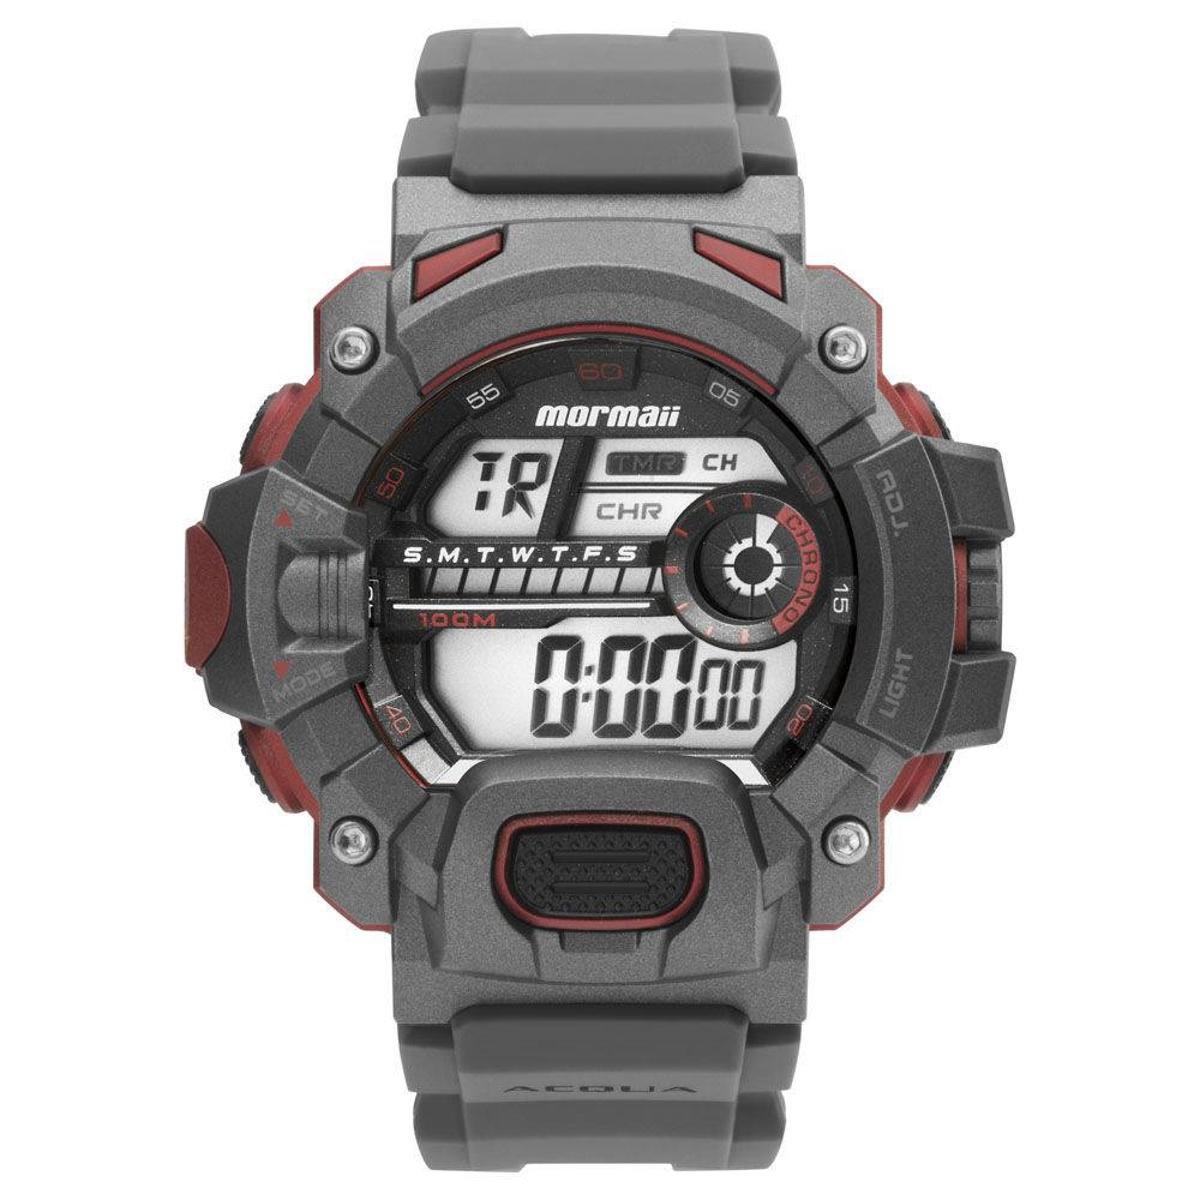 ee7c3d26b45 Relógio Masculino Mormaii Digital Action Mo1132ae  - Grafite ...